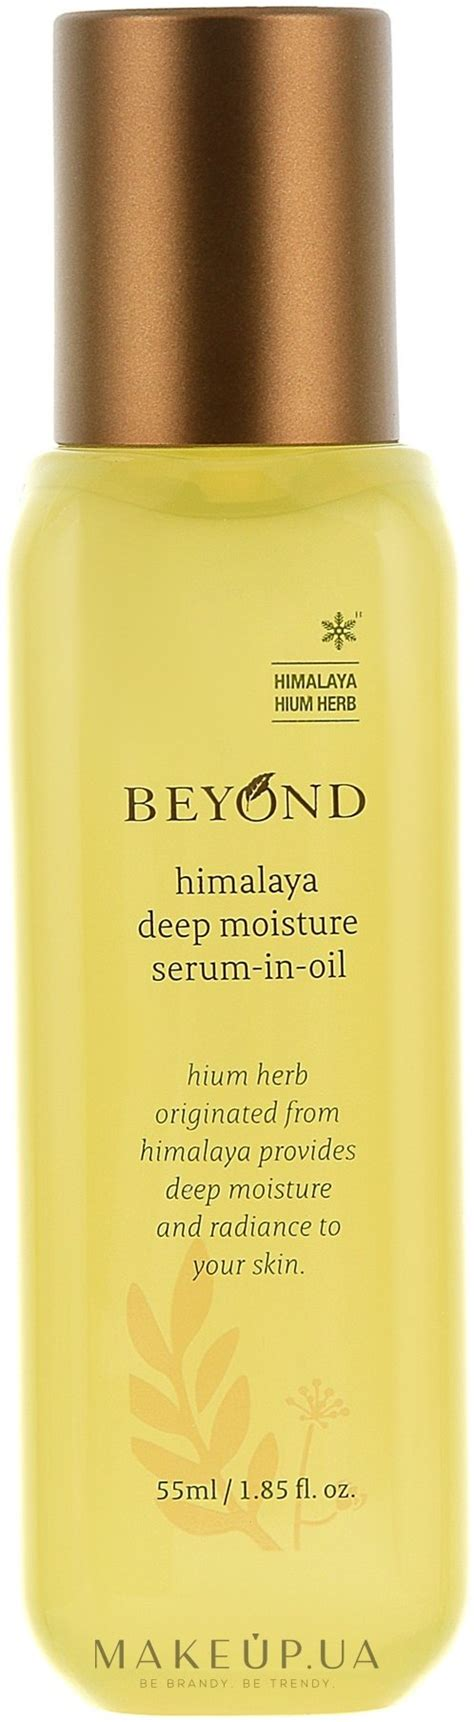 Serum Himalaya makeup сыворотка масло для лица beyond himalaya